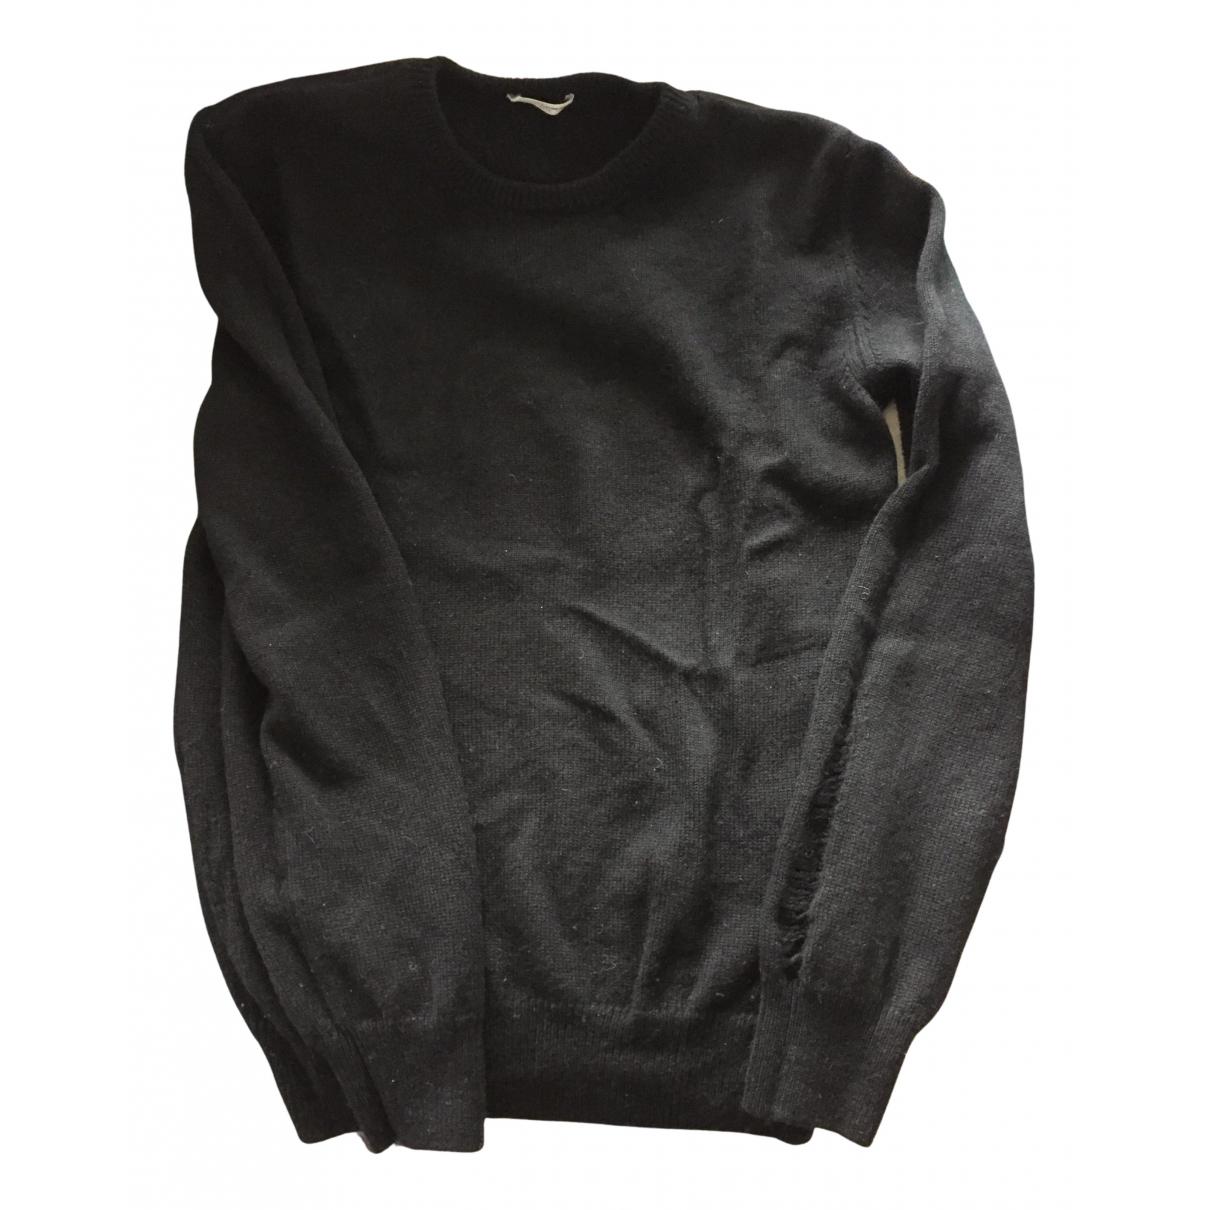 Saint Laurent N Black Cashmere Knitwear for Women S International